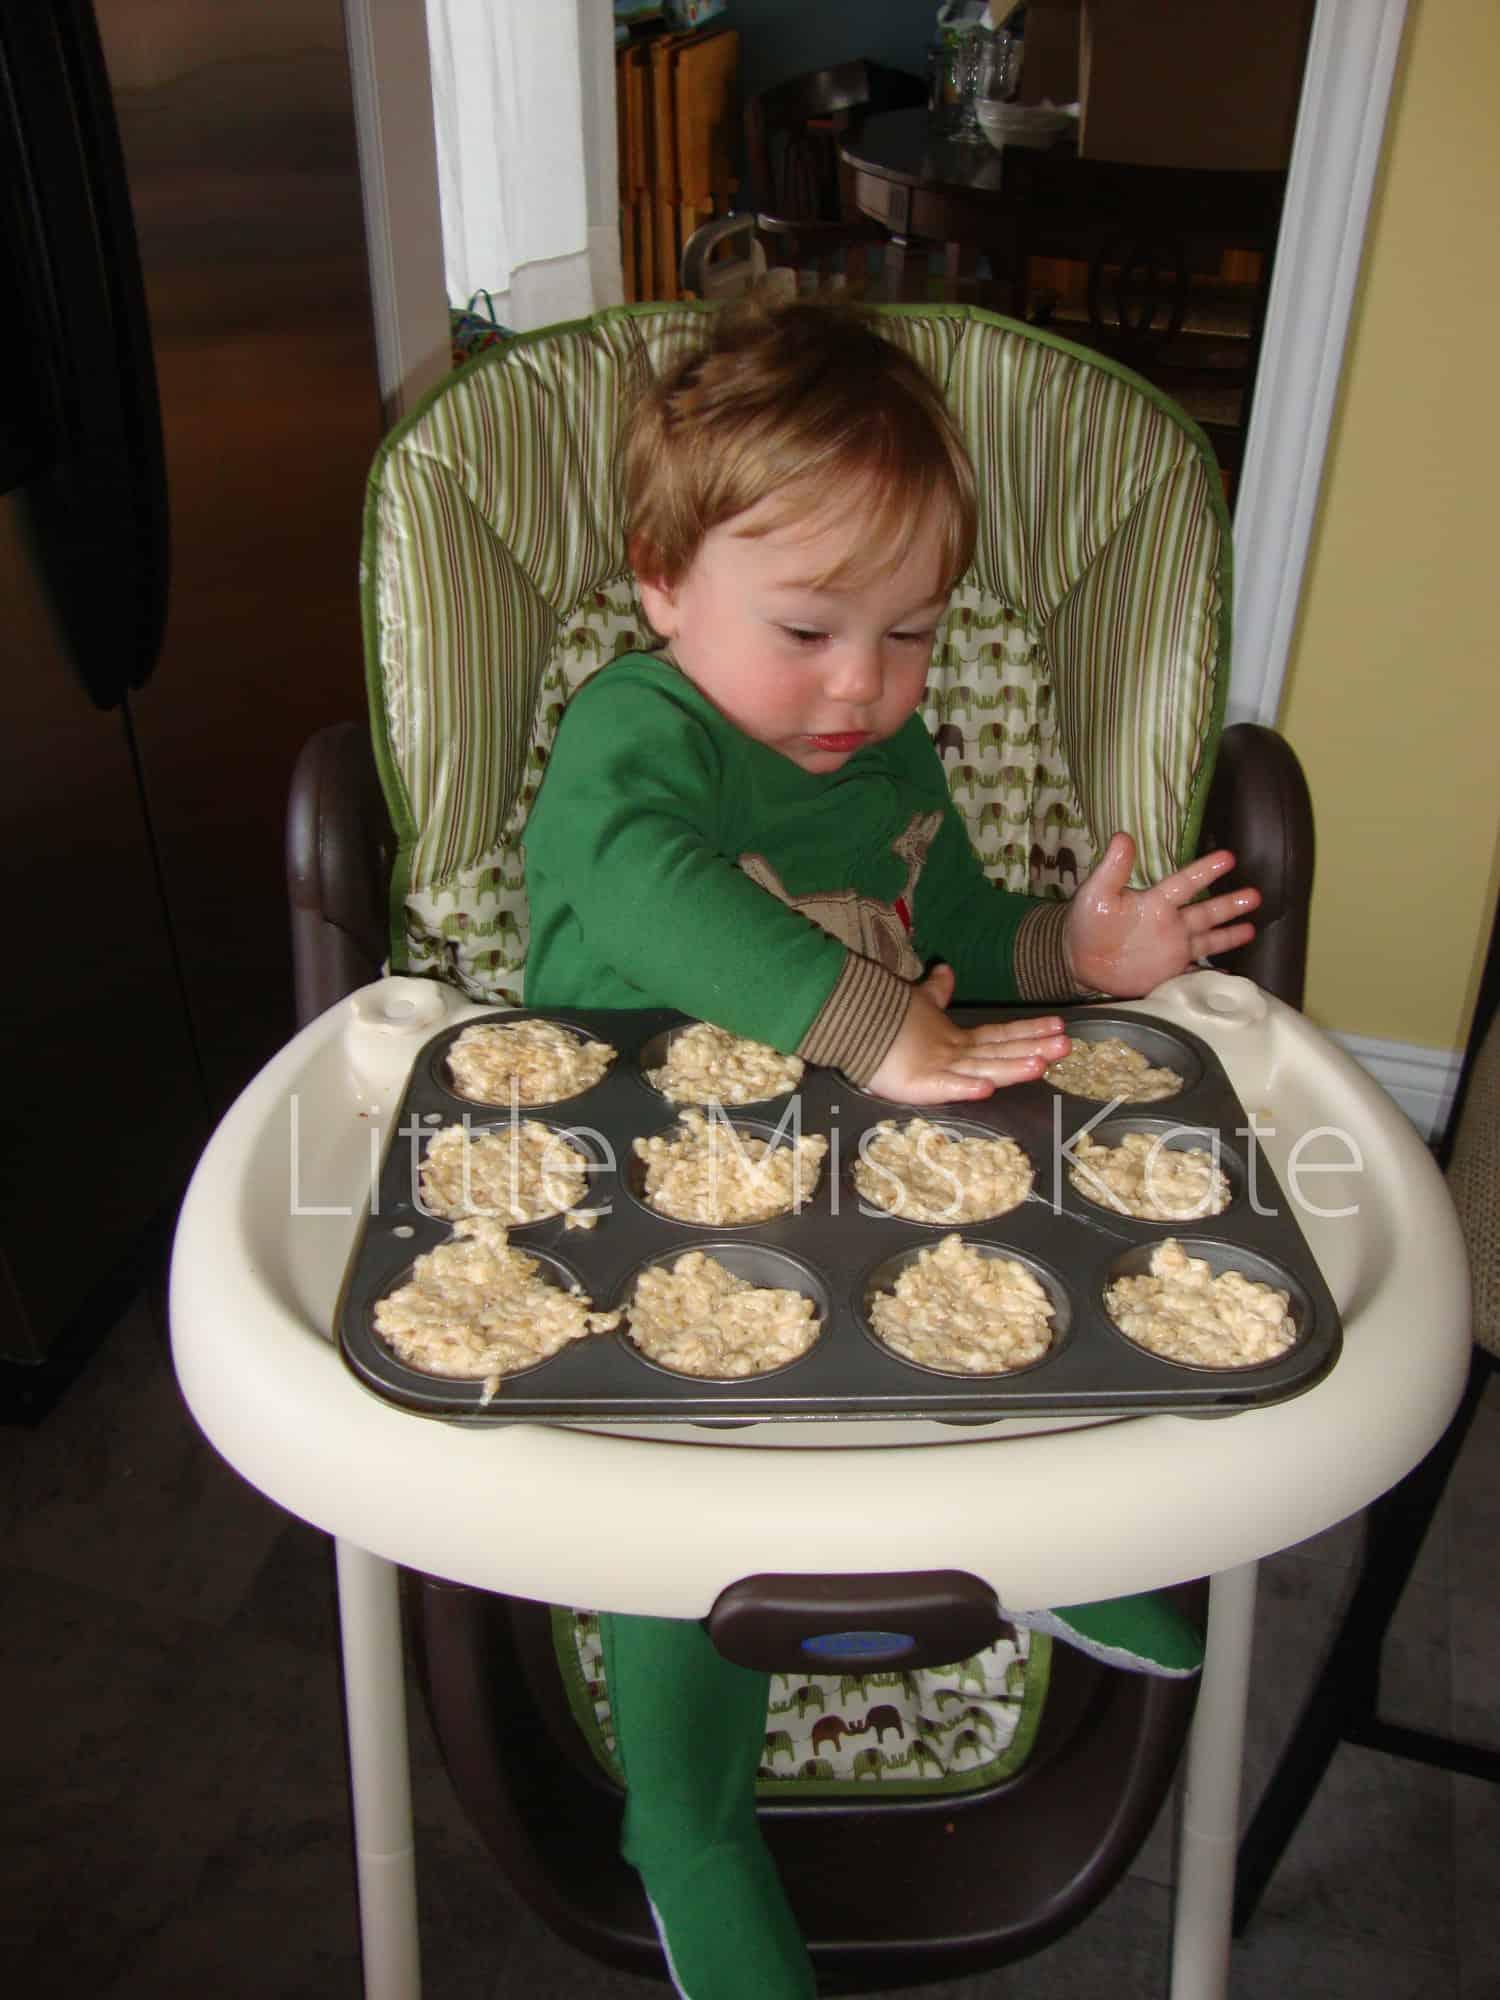 Easy Easter rice krispies nests recipe via littlemisskate.ca